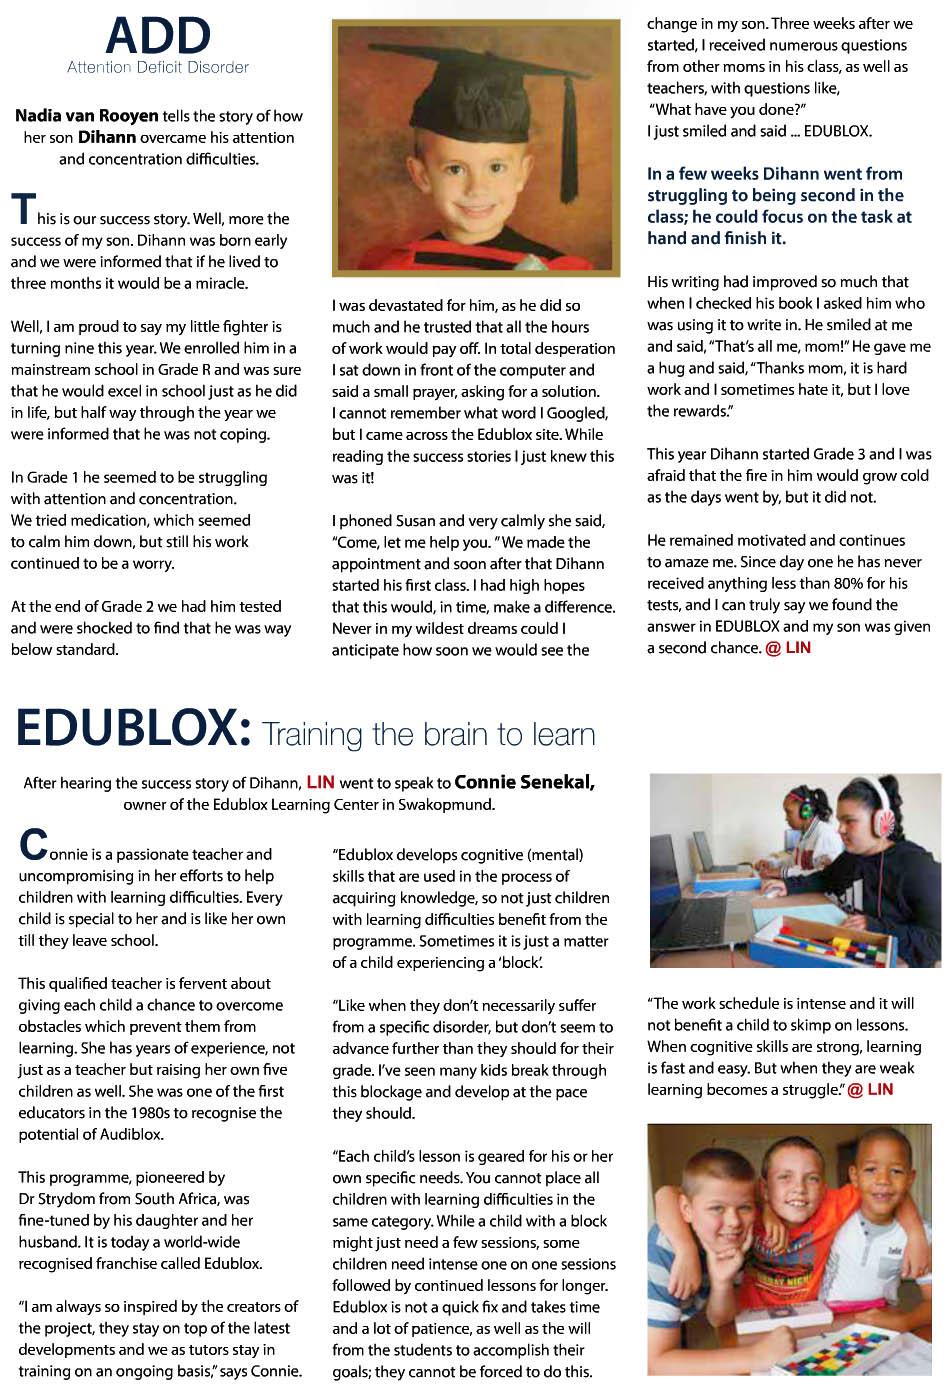 Edublox in LIN magazine